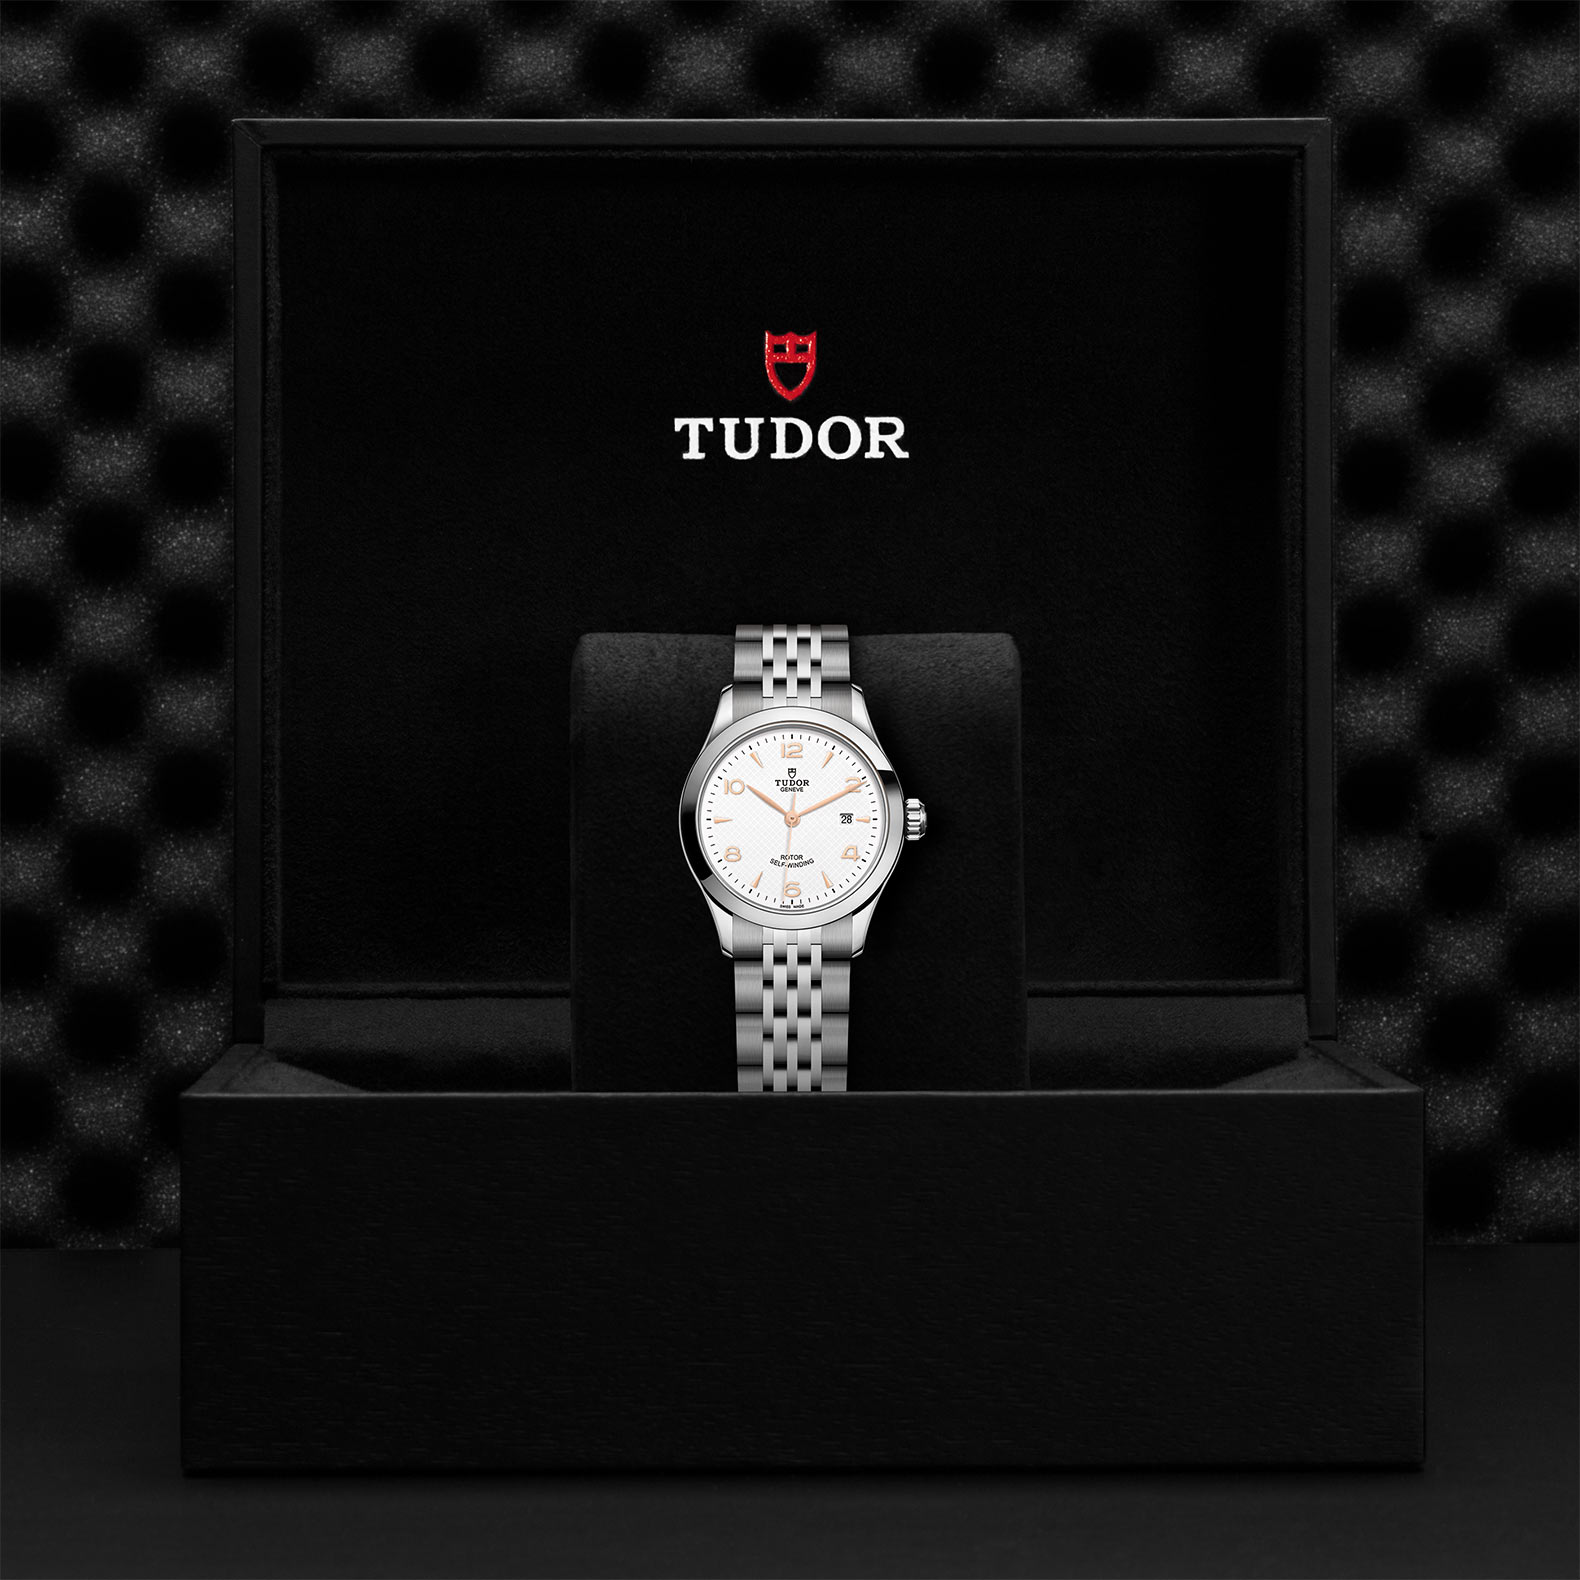 TUDOR 1926 - M91350-0011